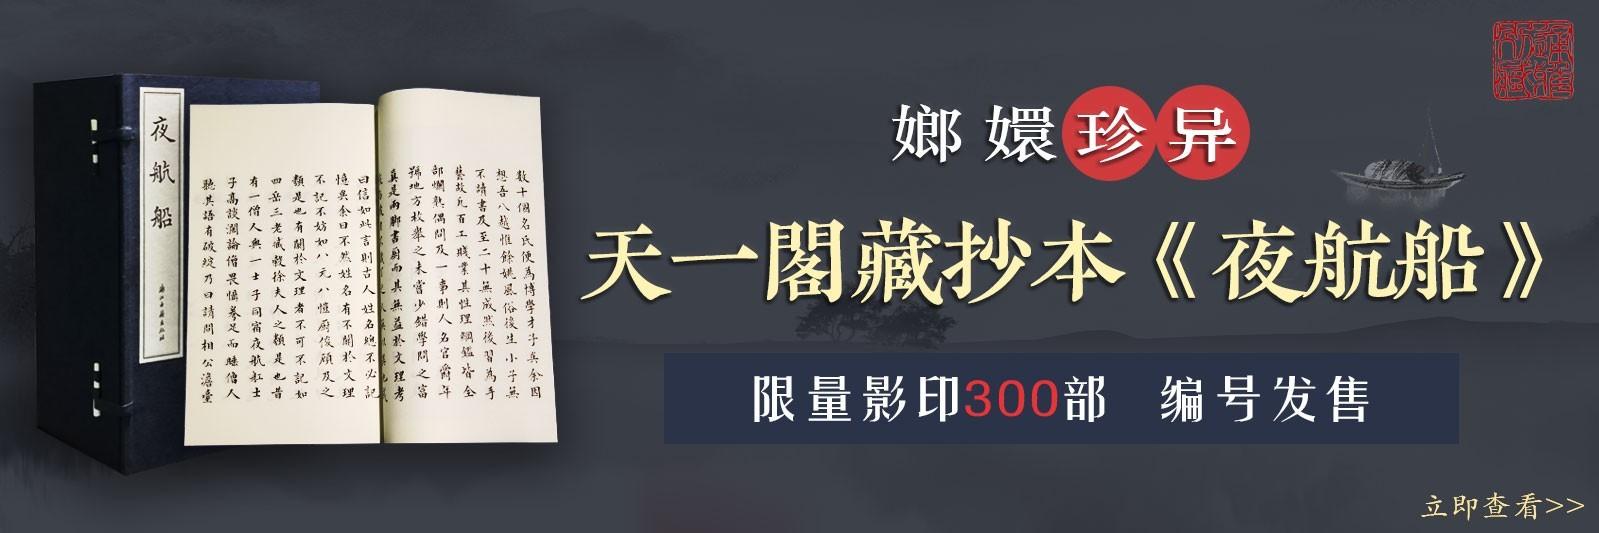 http://book.kongfz.com/3669/2635343798/